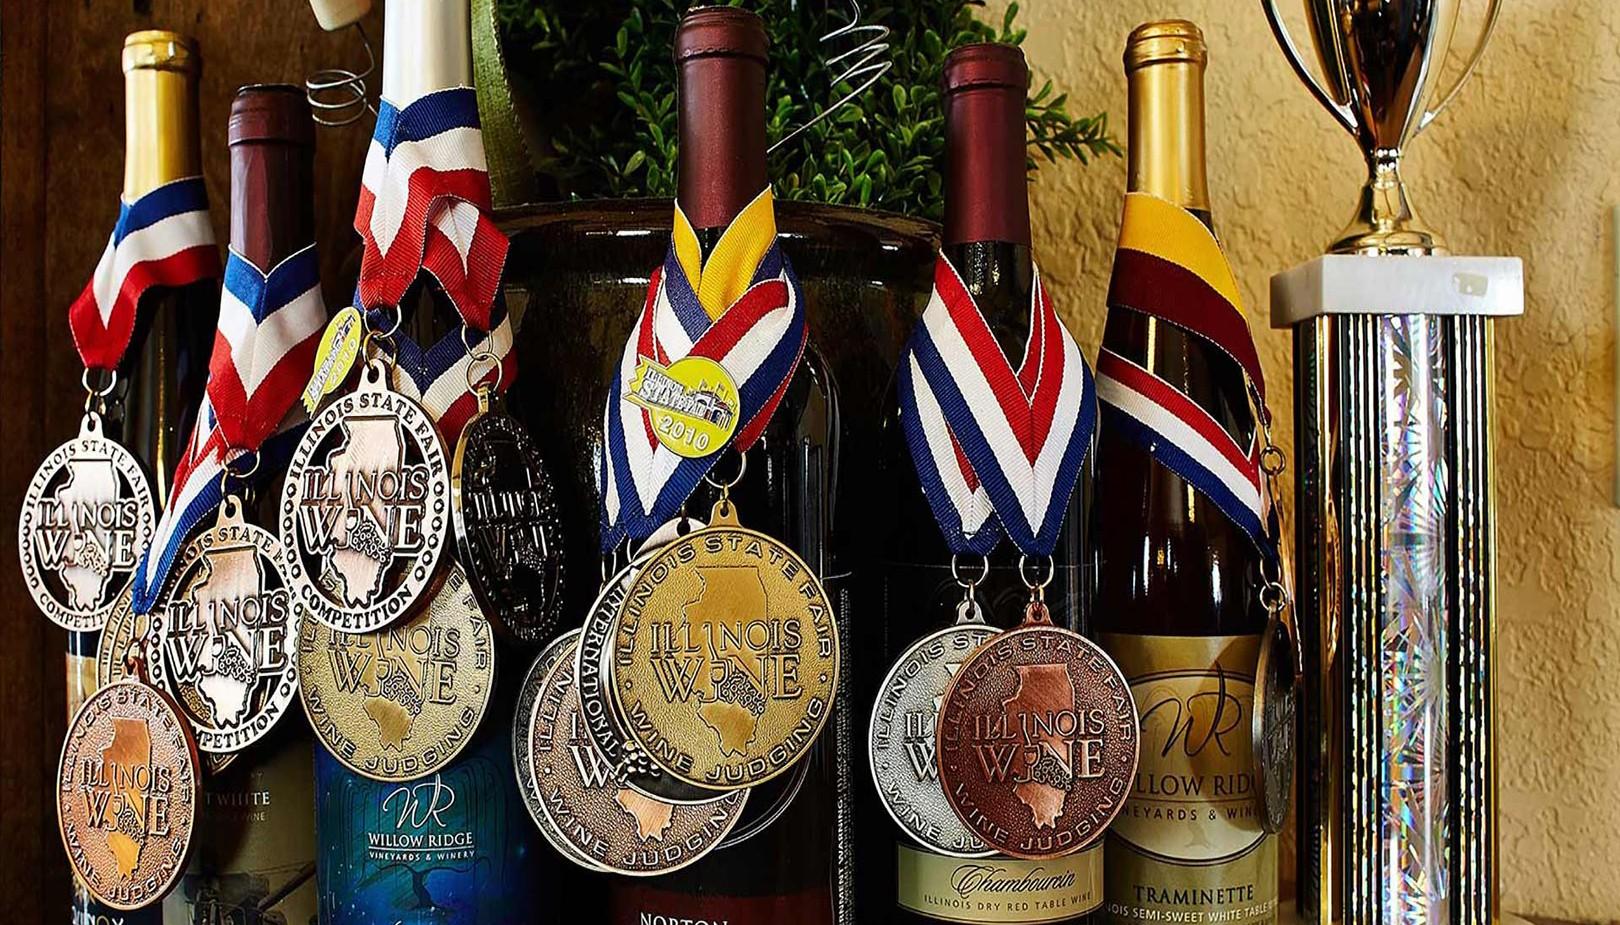 willow-ridge-winery-award-winning-wine-illinois-1920x1080